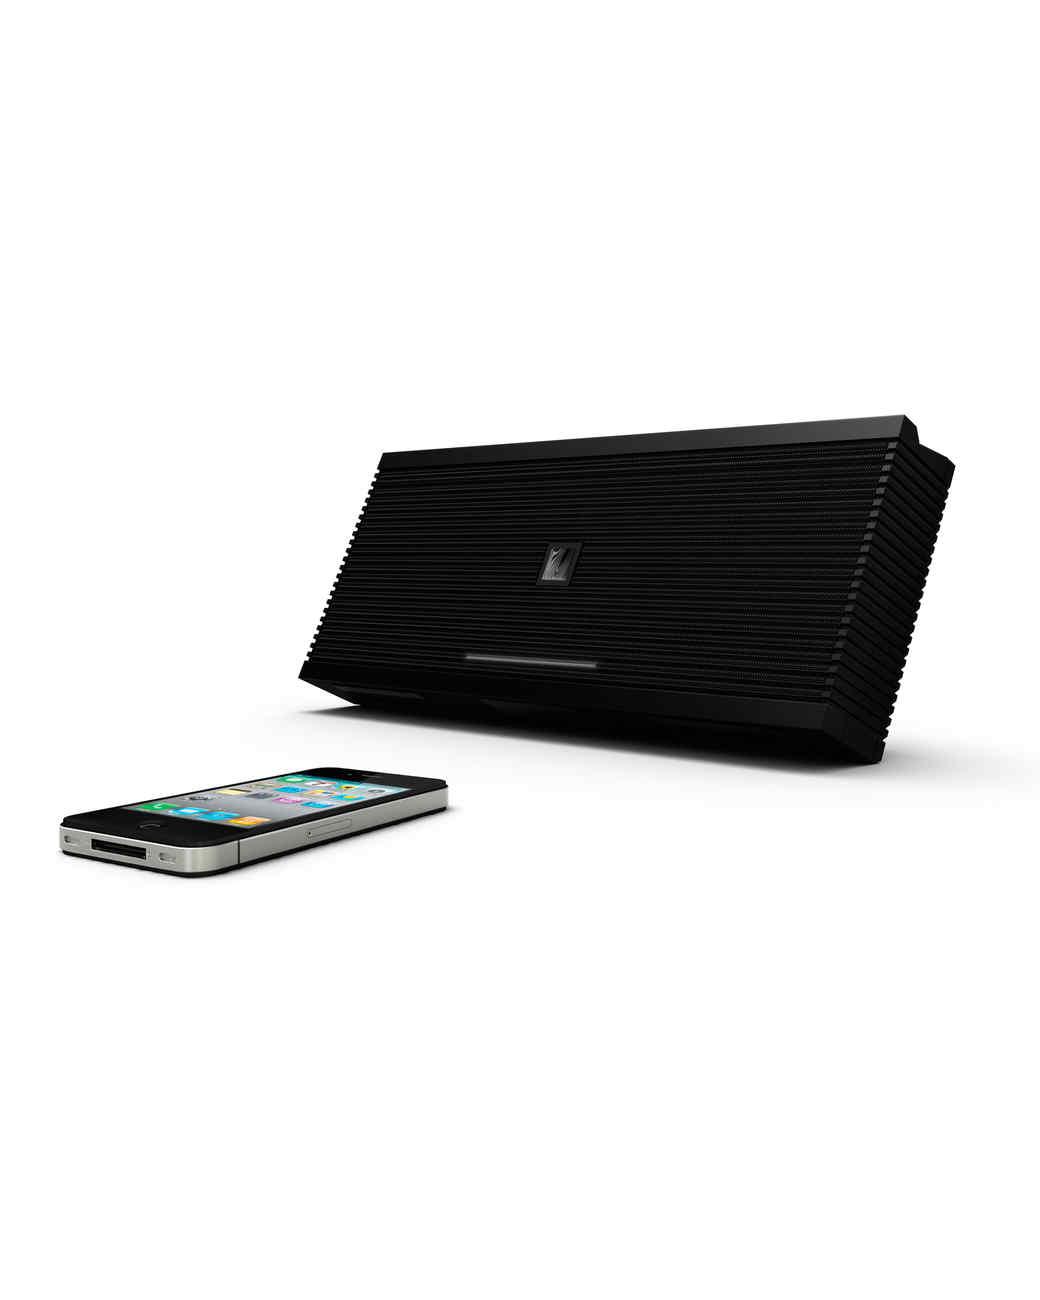 soundfreaq-soundkick-wireless-dock-system.jpg